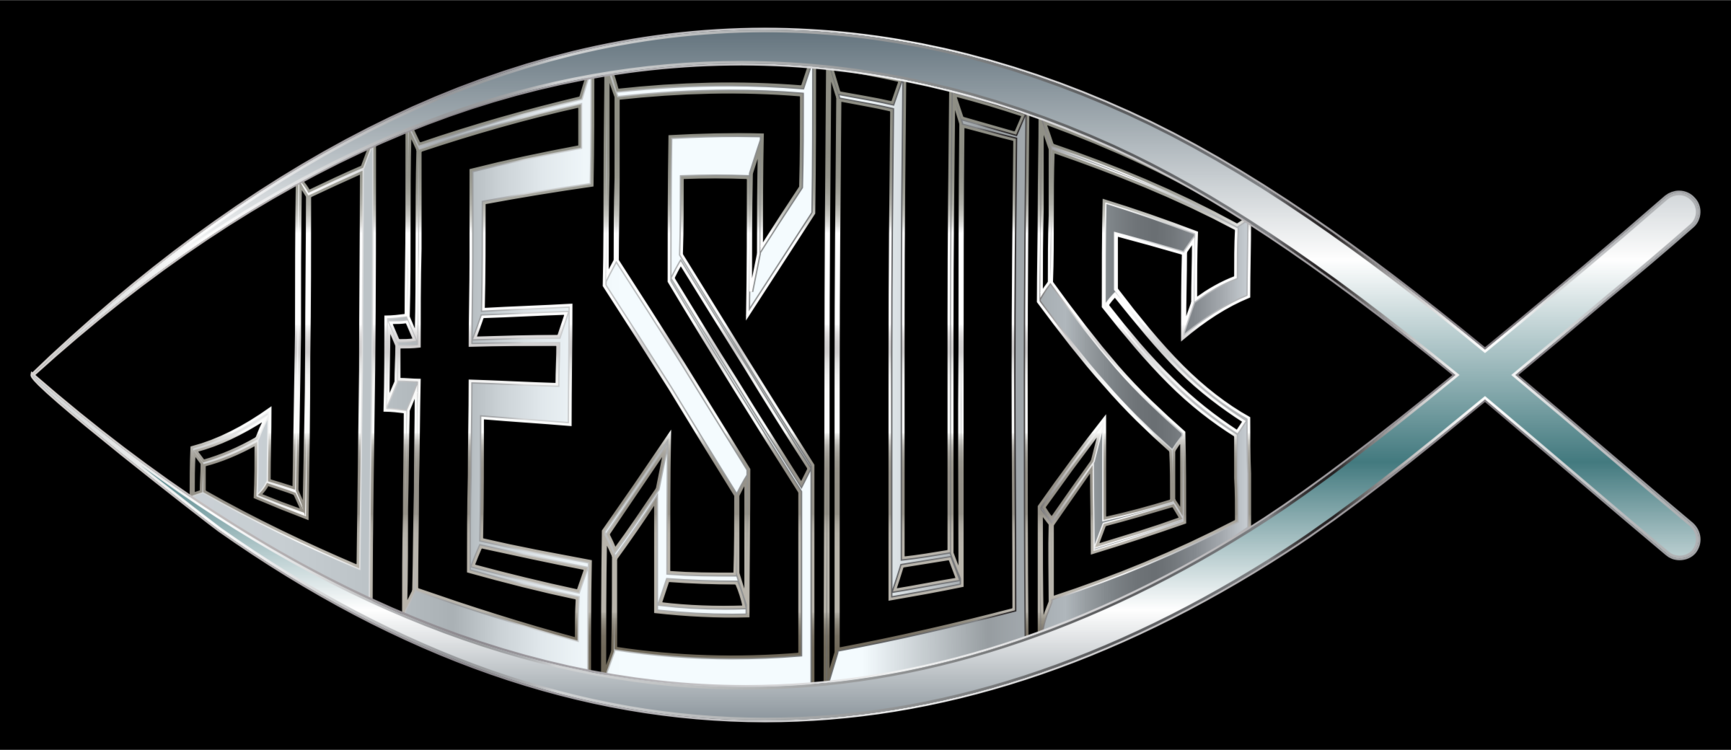 Wheel,Emblem,Brand